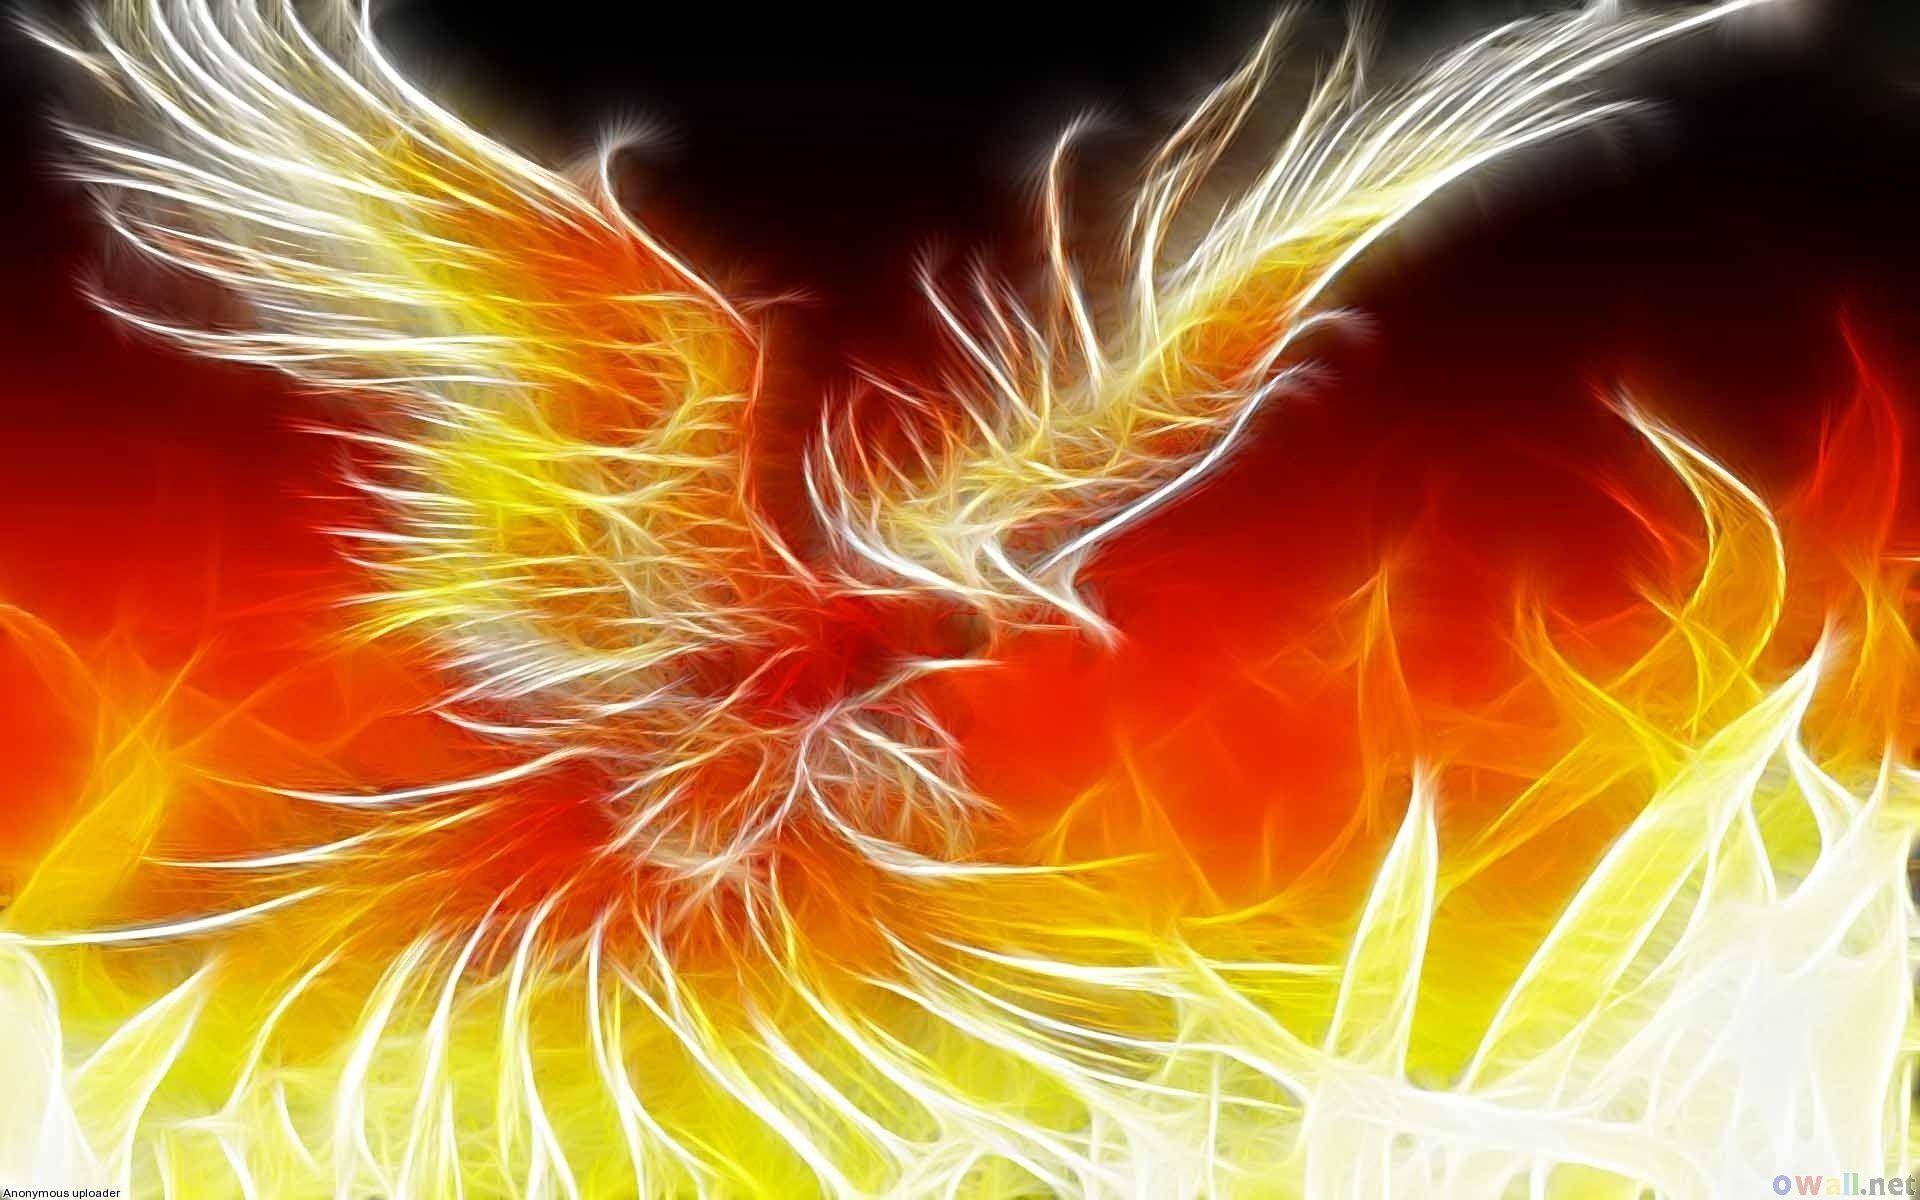 52 Phoenix Hd Wallpapers Backgrounds Wallpaper Abyss Phoenix Wallpaper Phoenix Images Bird Wallpaper